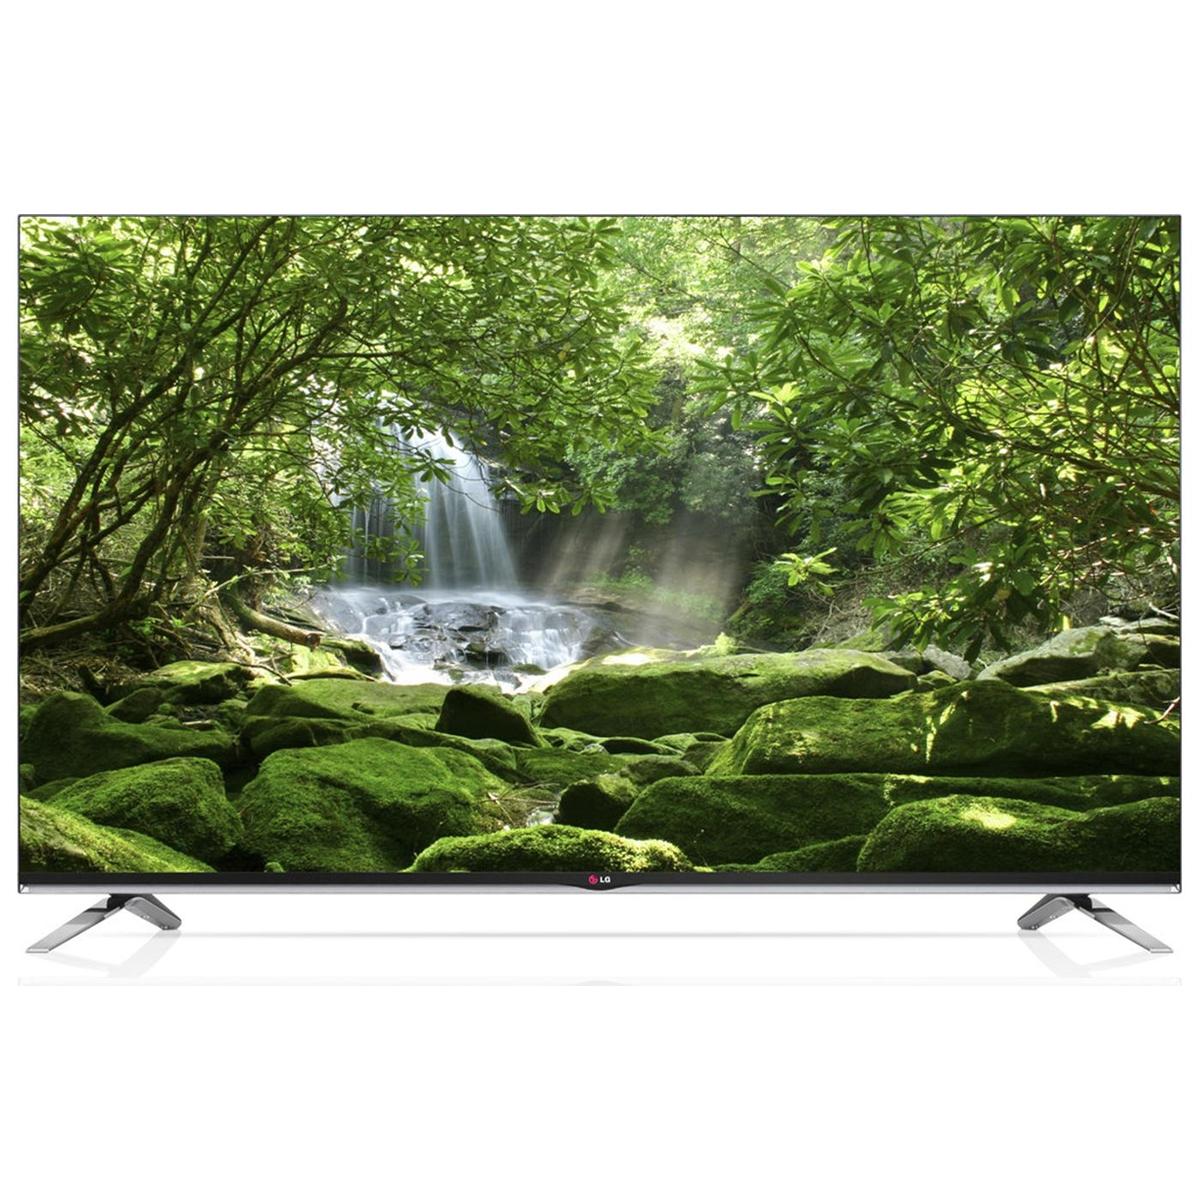 LG 55inch 7200 Series LED HDTV - 55LB7200